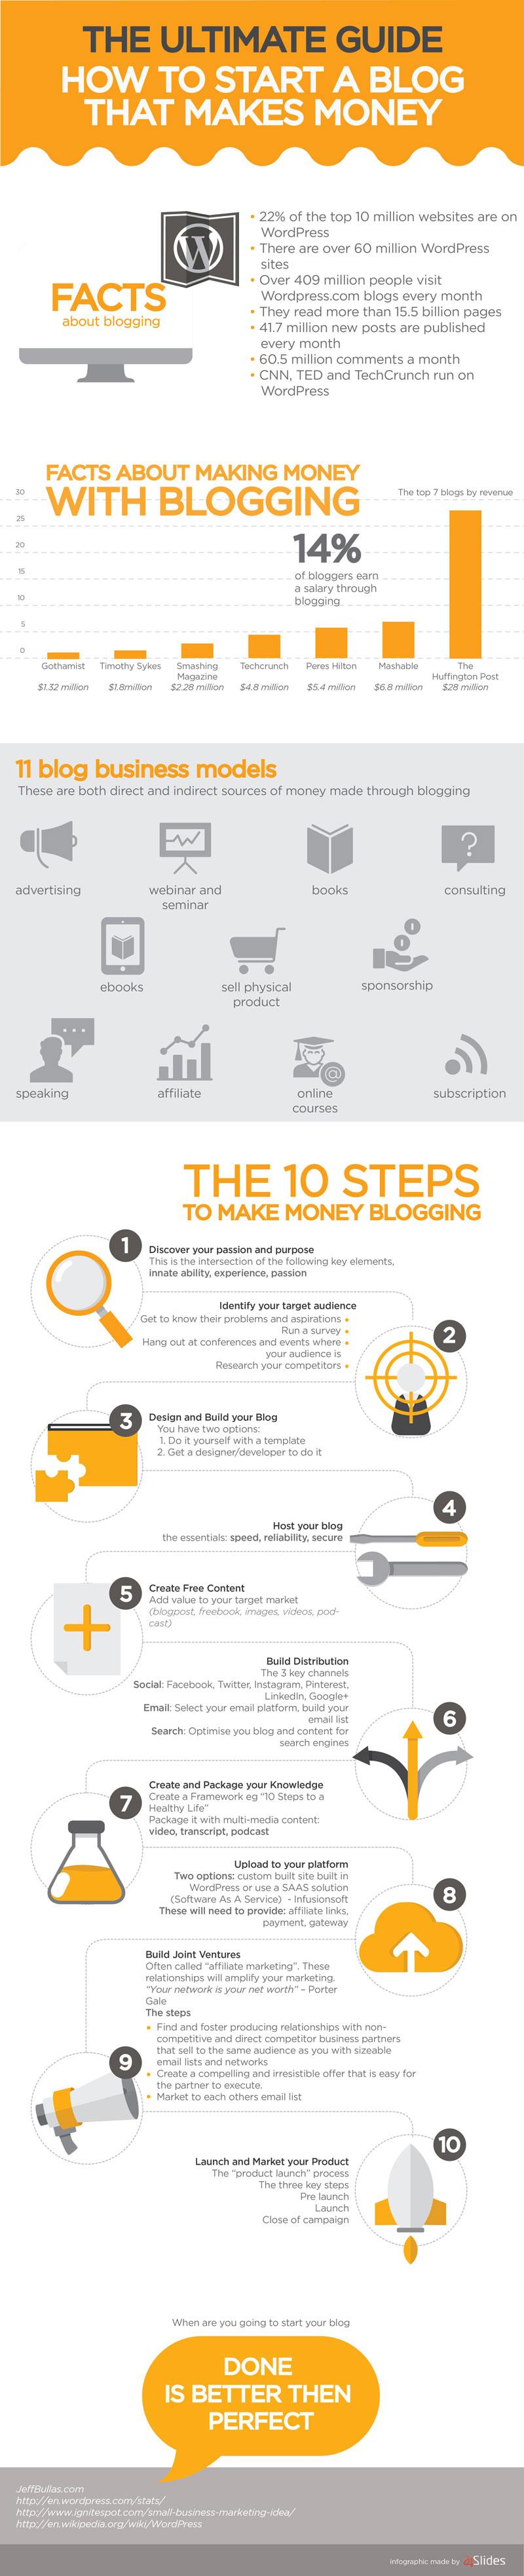 Ultimate-blogging-guide